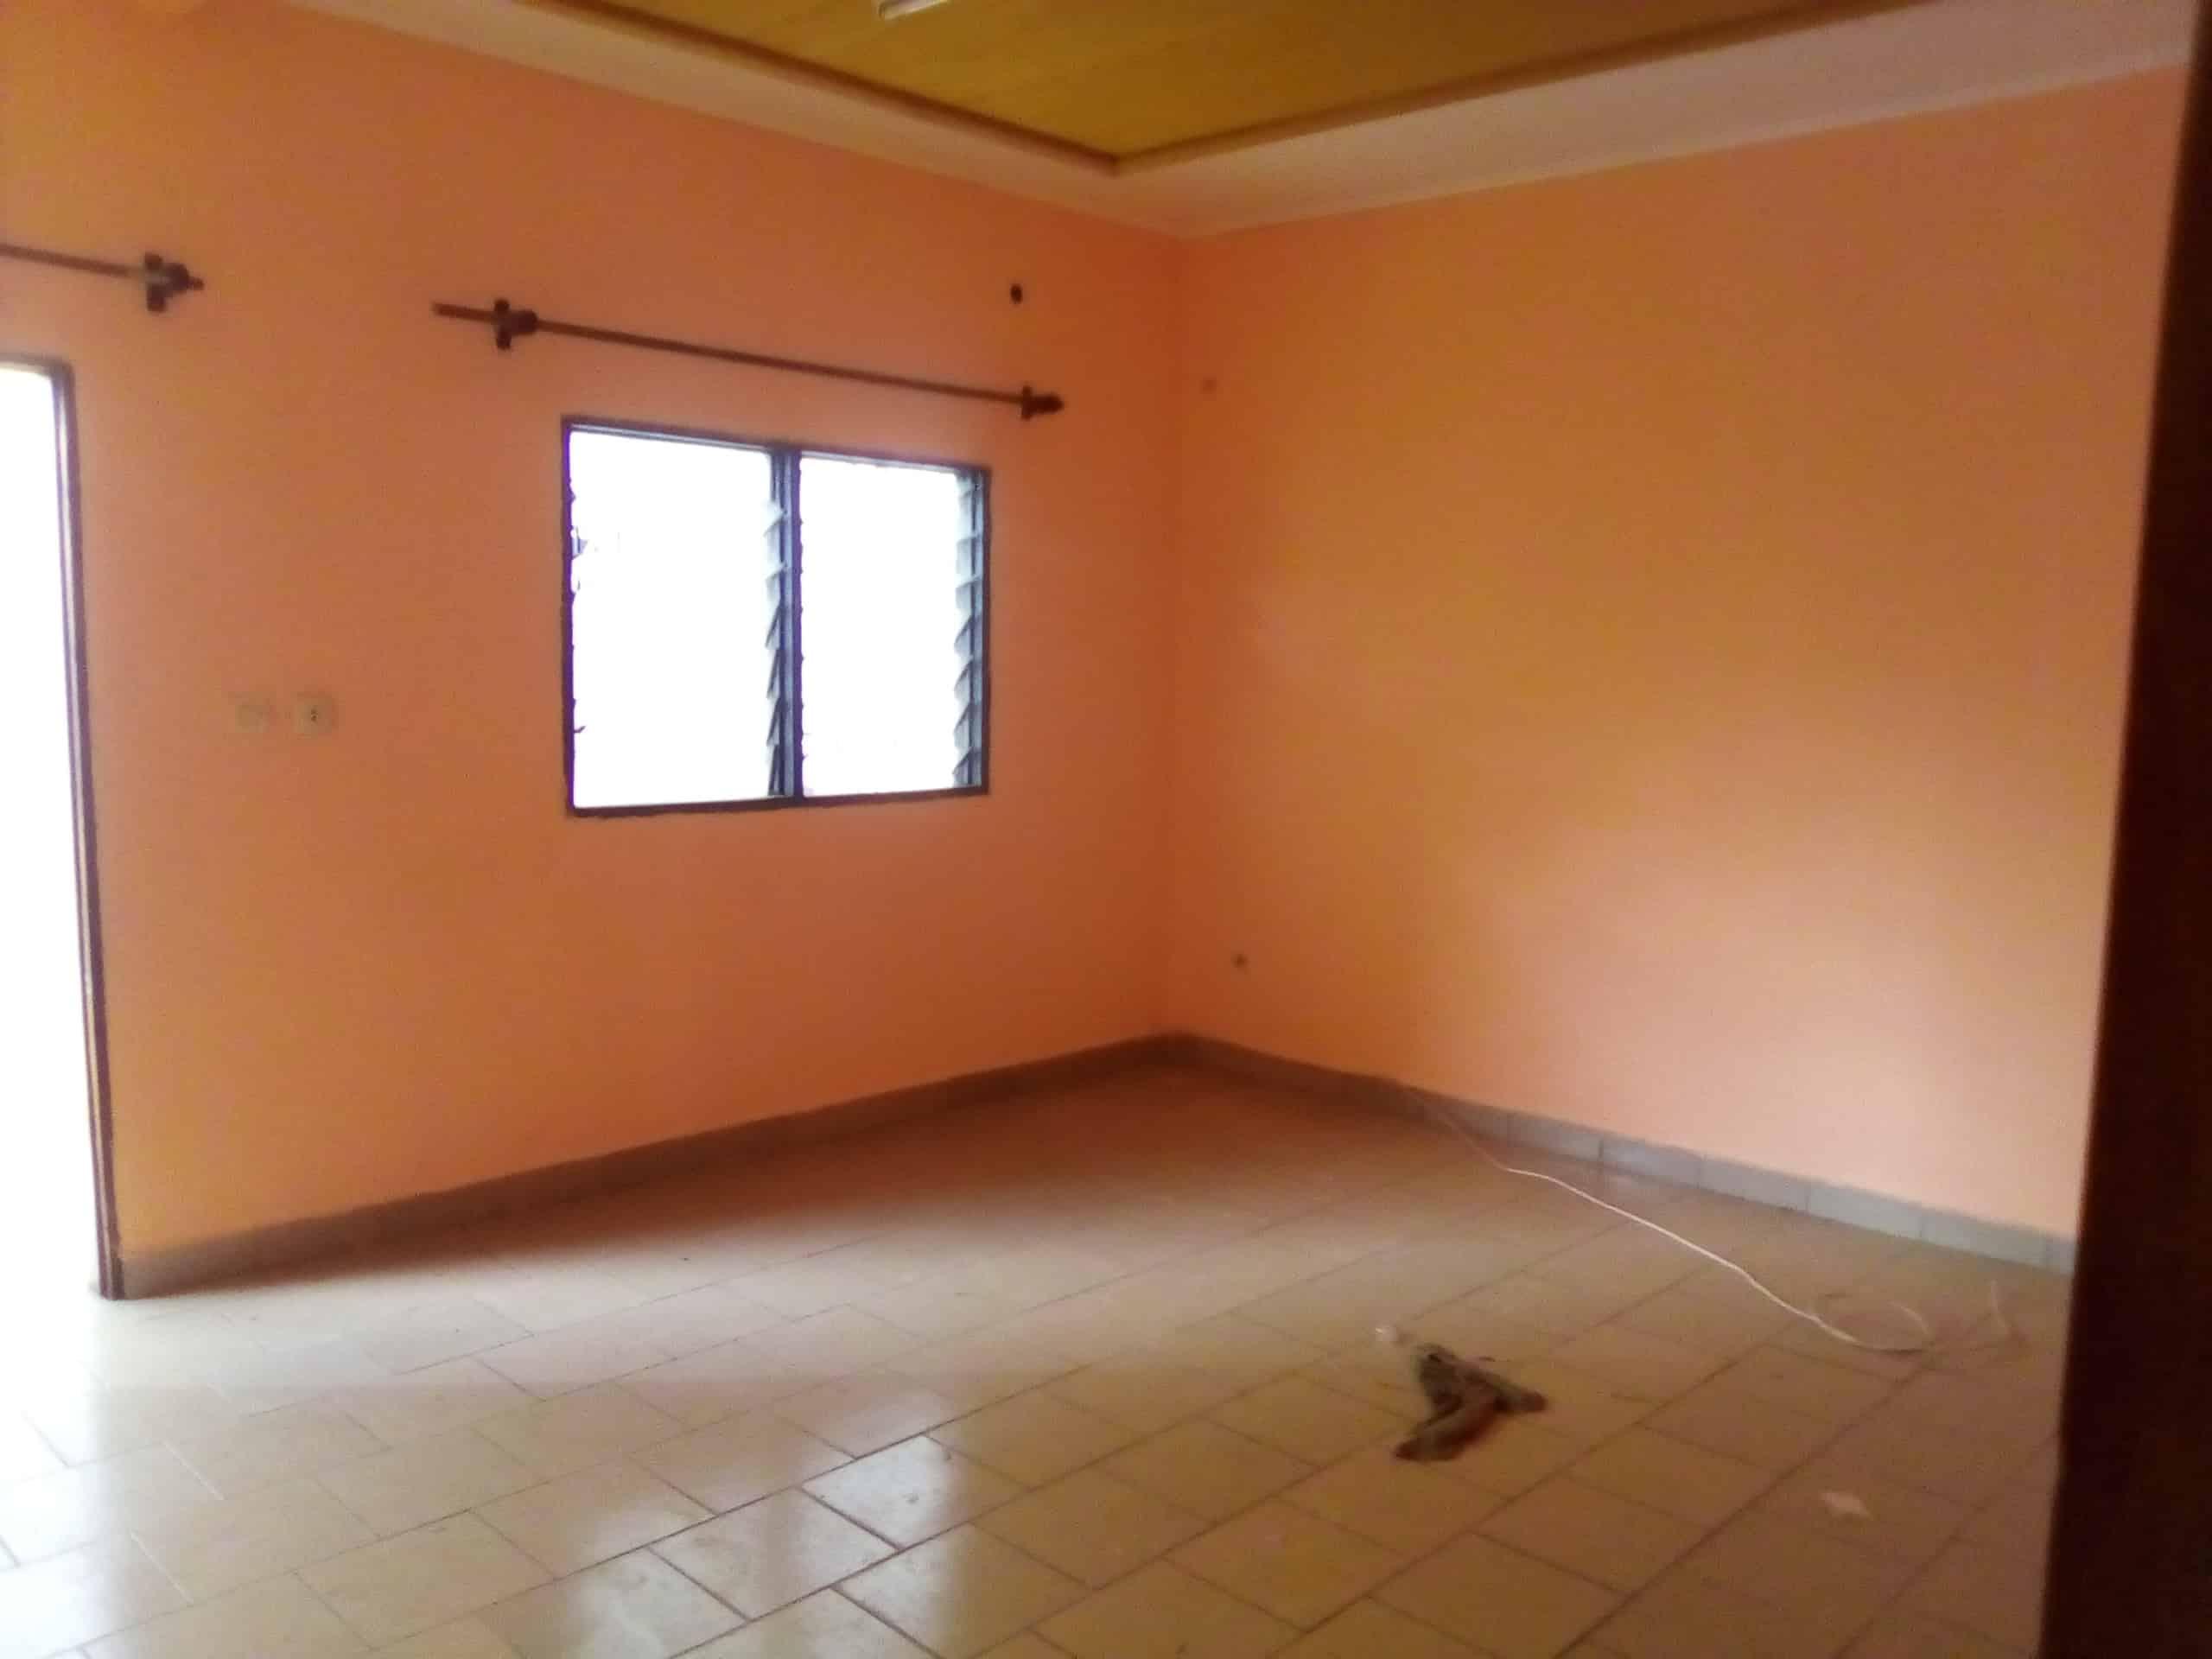 House (Villa) to rent - Douala, Makepe, MAKEPE - 1 living room(s), 3 bedroom(s), 2 bathroom(s) - 150 000 FCFA / month